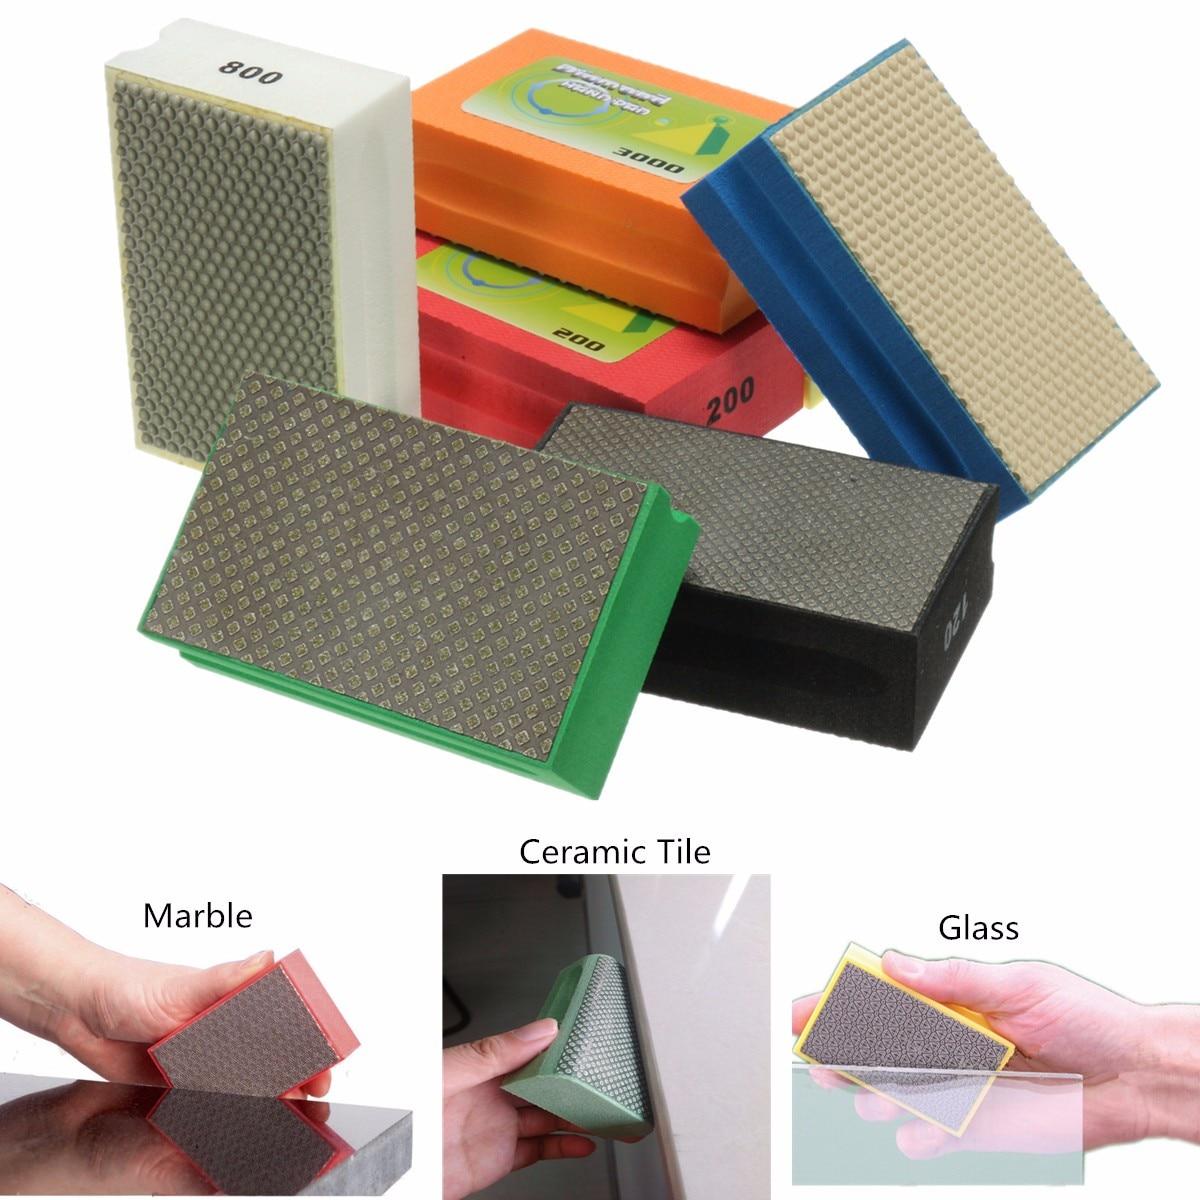 Diamond Polishing Hand Pad Block For Granite Marble Stone Grinding 60-3000 Grit Polish Hand Pads For Polish Tools bengu 60 120 200 400 diamond hand polishing pad sanding grinding for glass stone marble 95x55mm